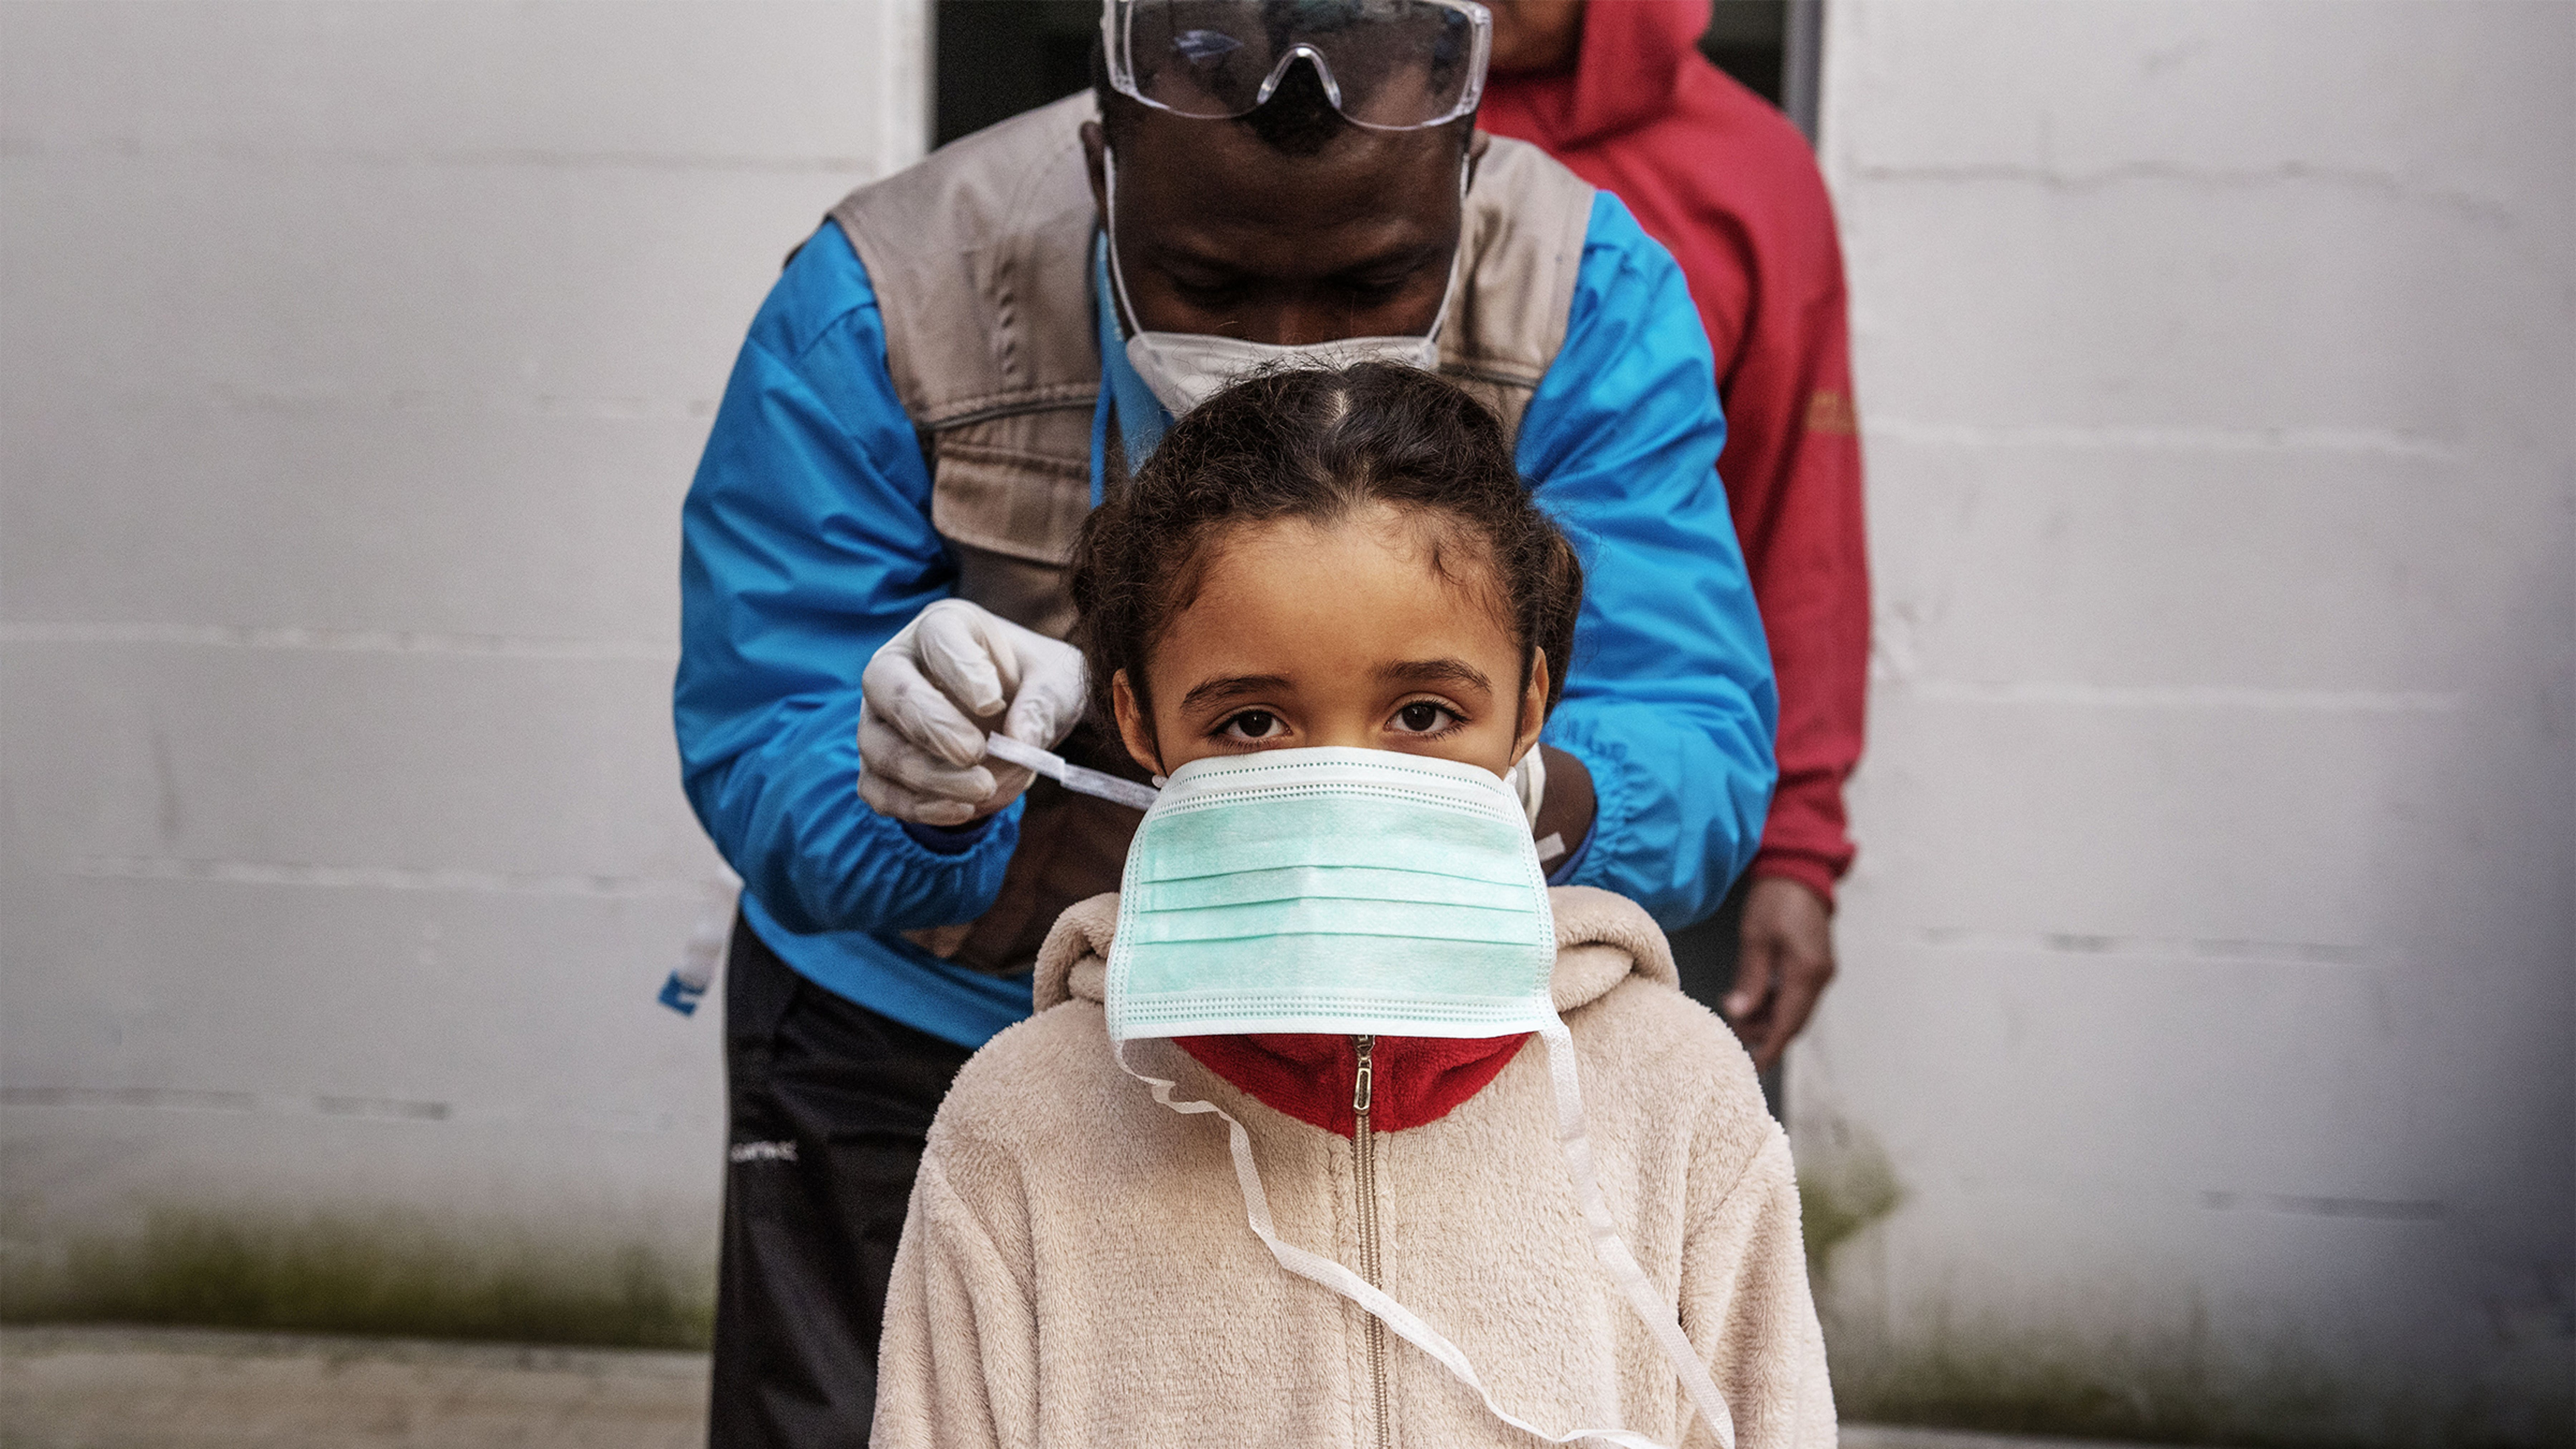 na bambina aiutata con una mascherina protettiva